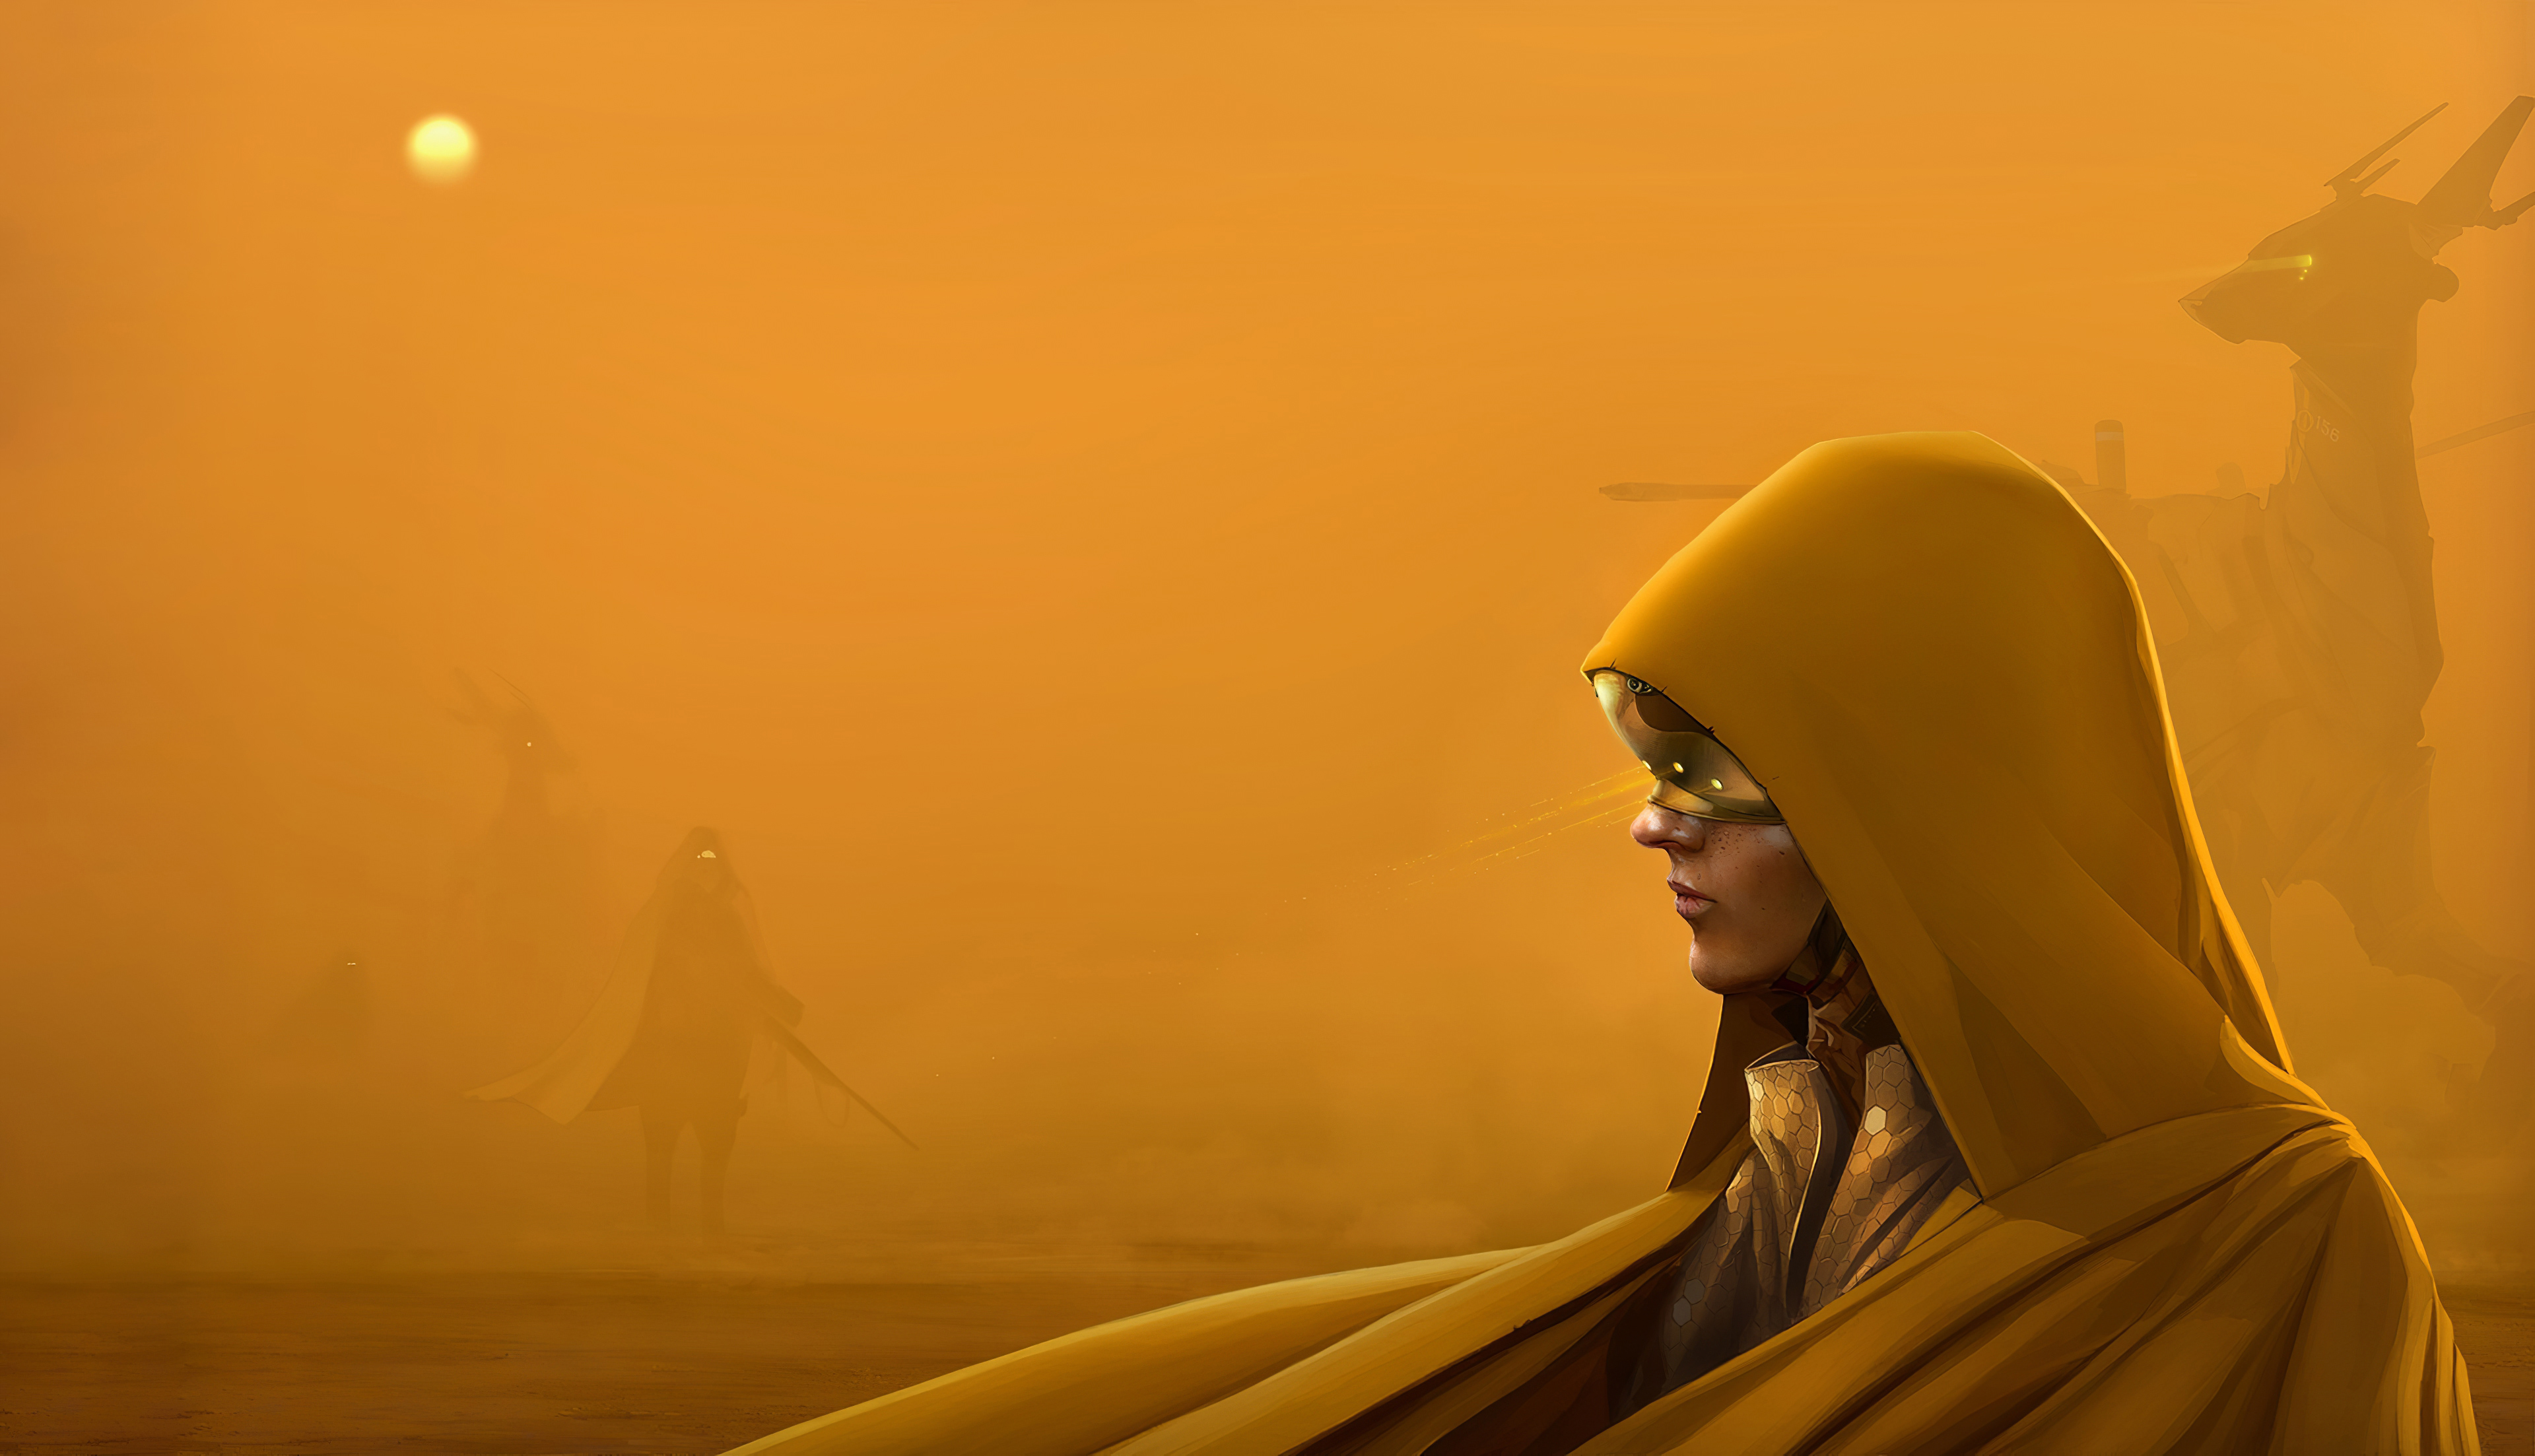 sand storm girl in hood 1578254725 - Sand Storm Girl In Hood -